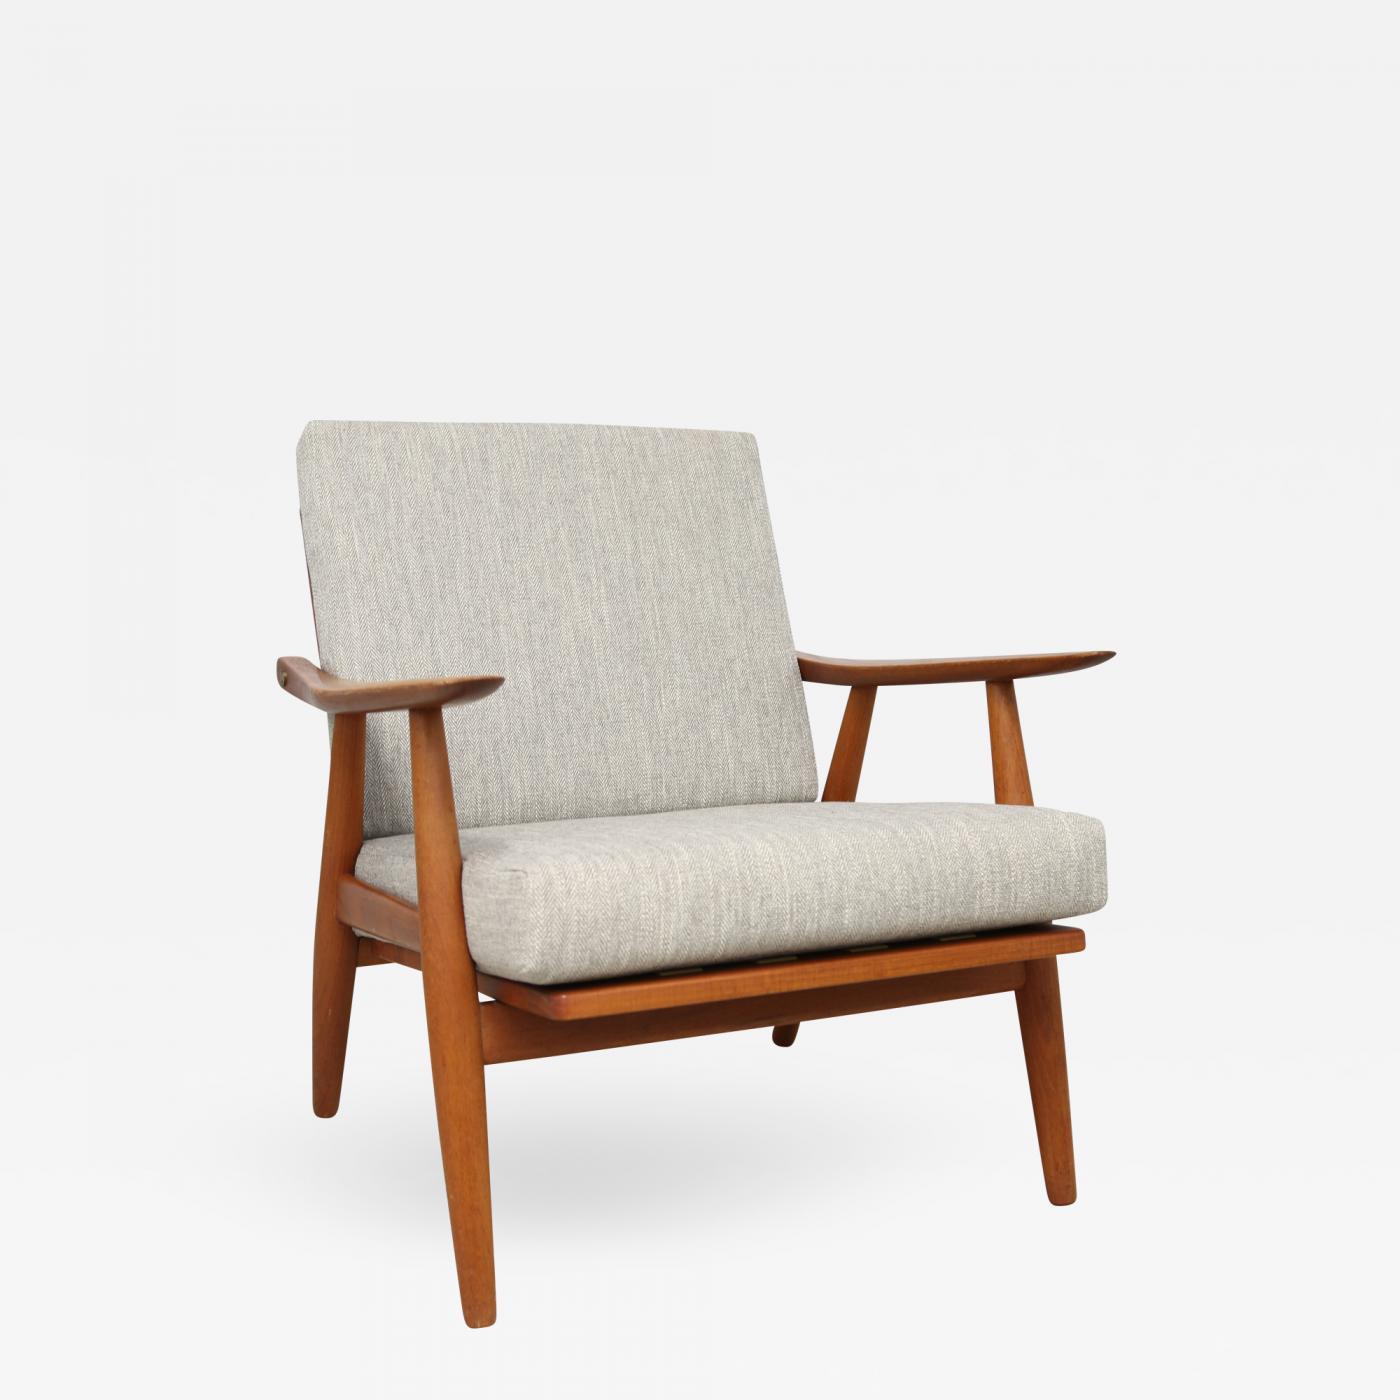 Hans J. Wegner for Getama Danish Mid-Century Lounge Armchair (Ge-270) & Hans J. Wegner for Getama Danish Mid-Century Lounge Armchair